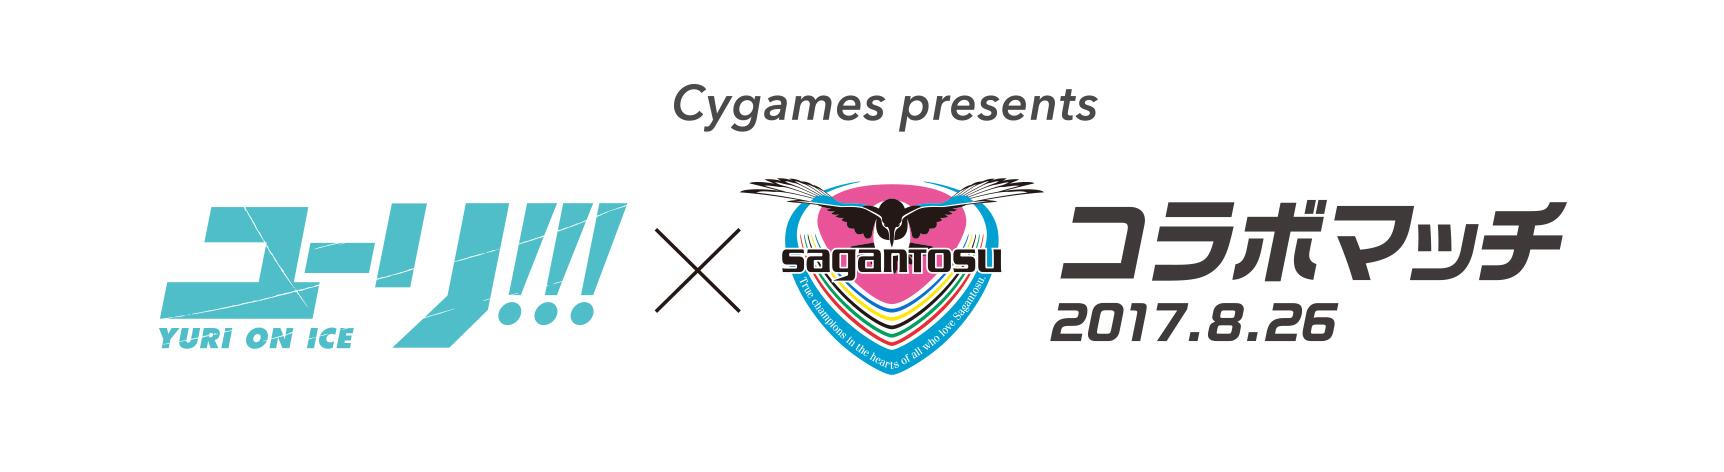 Cygames presents 「ユーリ!!! on ICE × サガン鳥栖」コラボマッチ